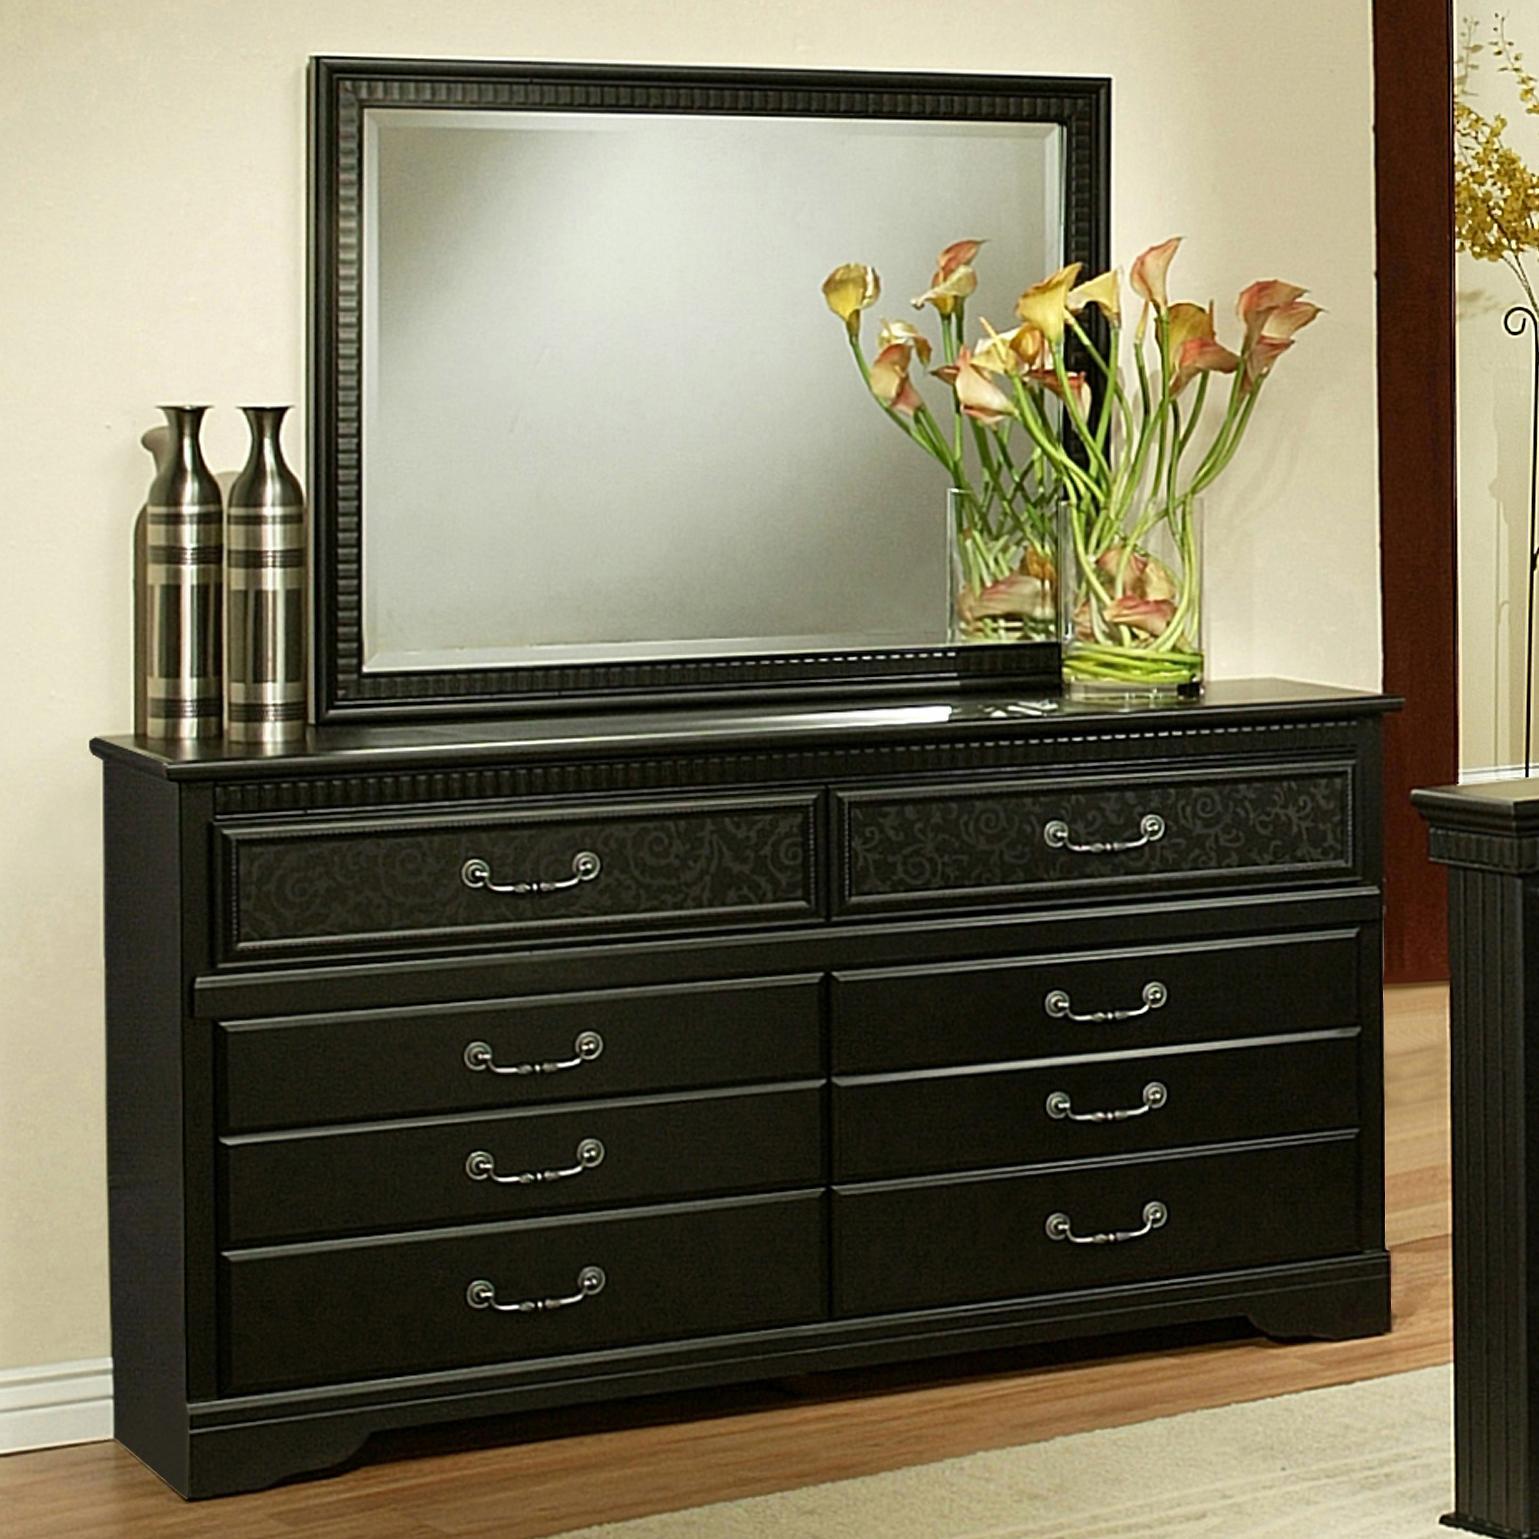 Sandberg Furniture Granada  Dresser & Mirror Set - Item Number: 34406+10